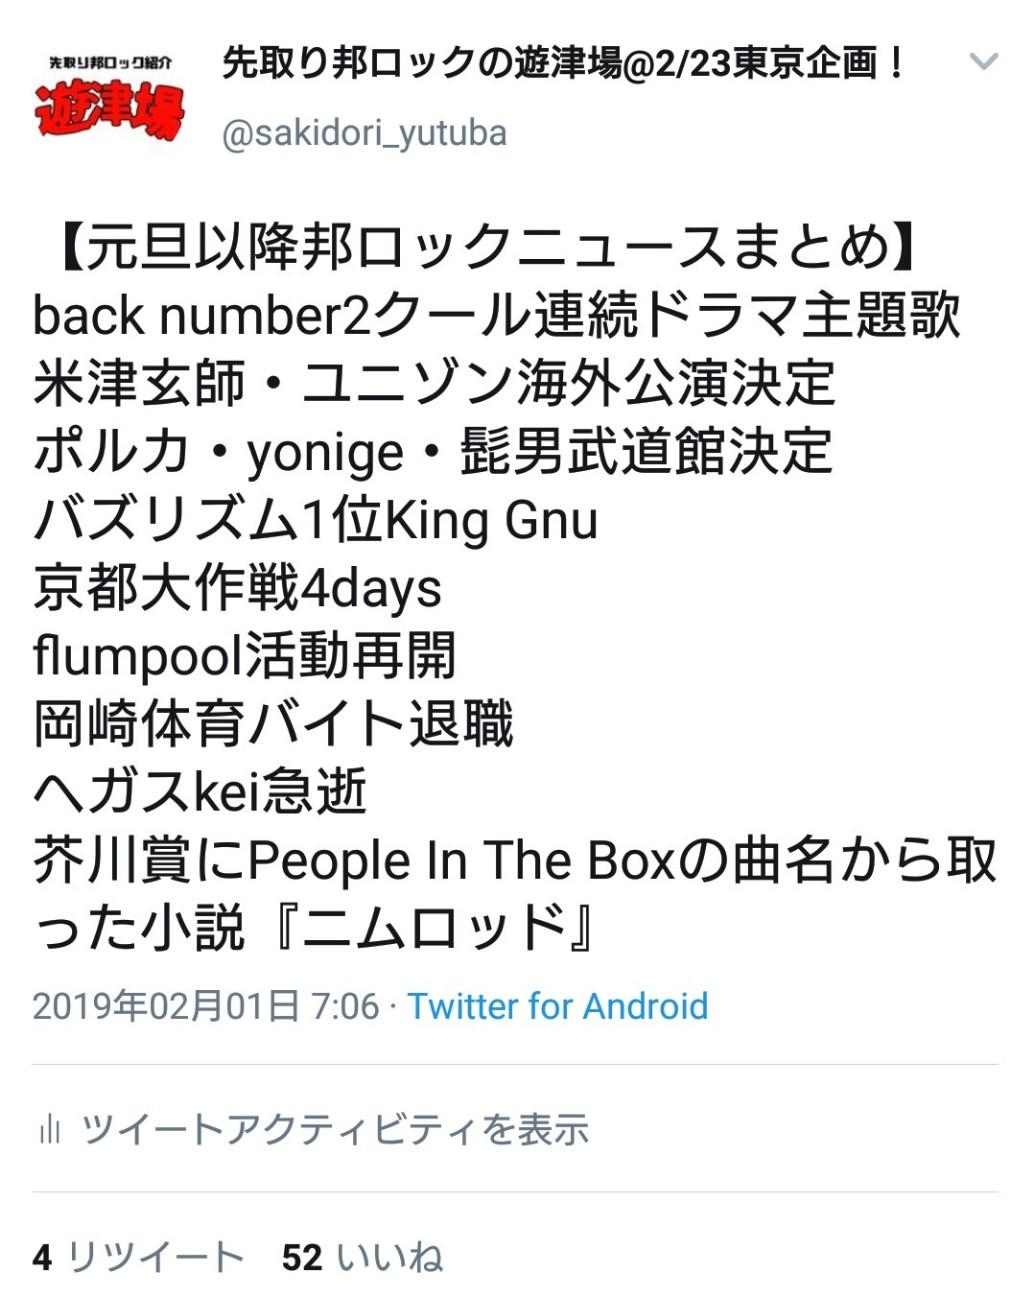 f:id:sakidoriyutsubarock:20191218002708j:plain